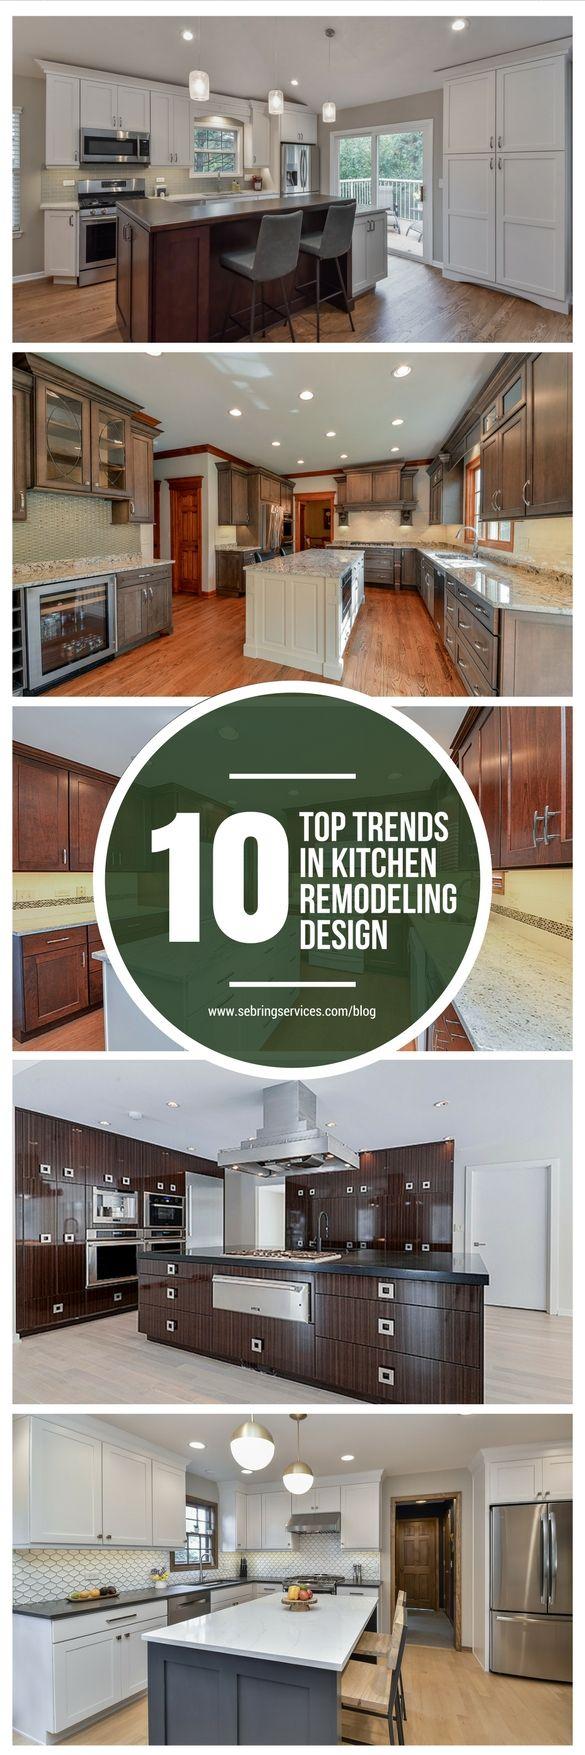 719 best kitchen design trends images on pinterest remodeling 10 top trends in kitchen design for 2017